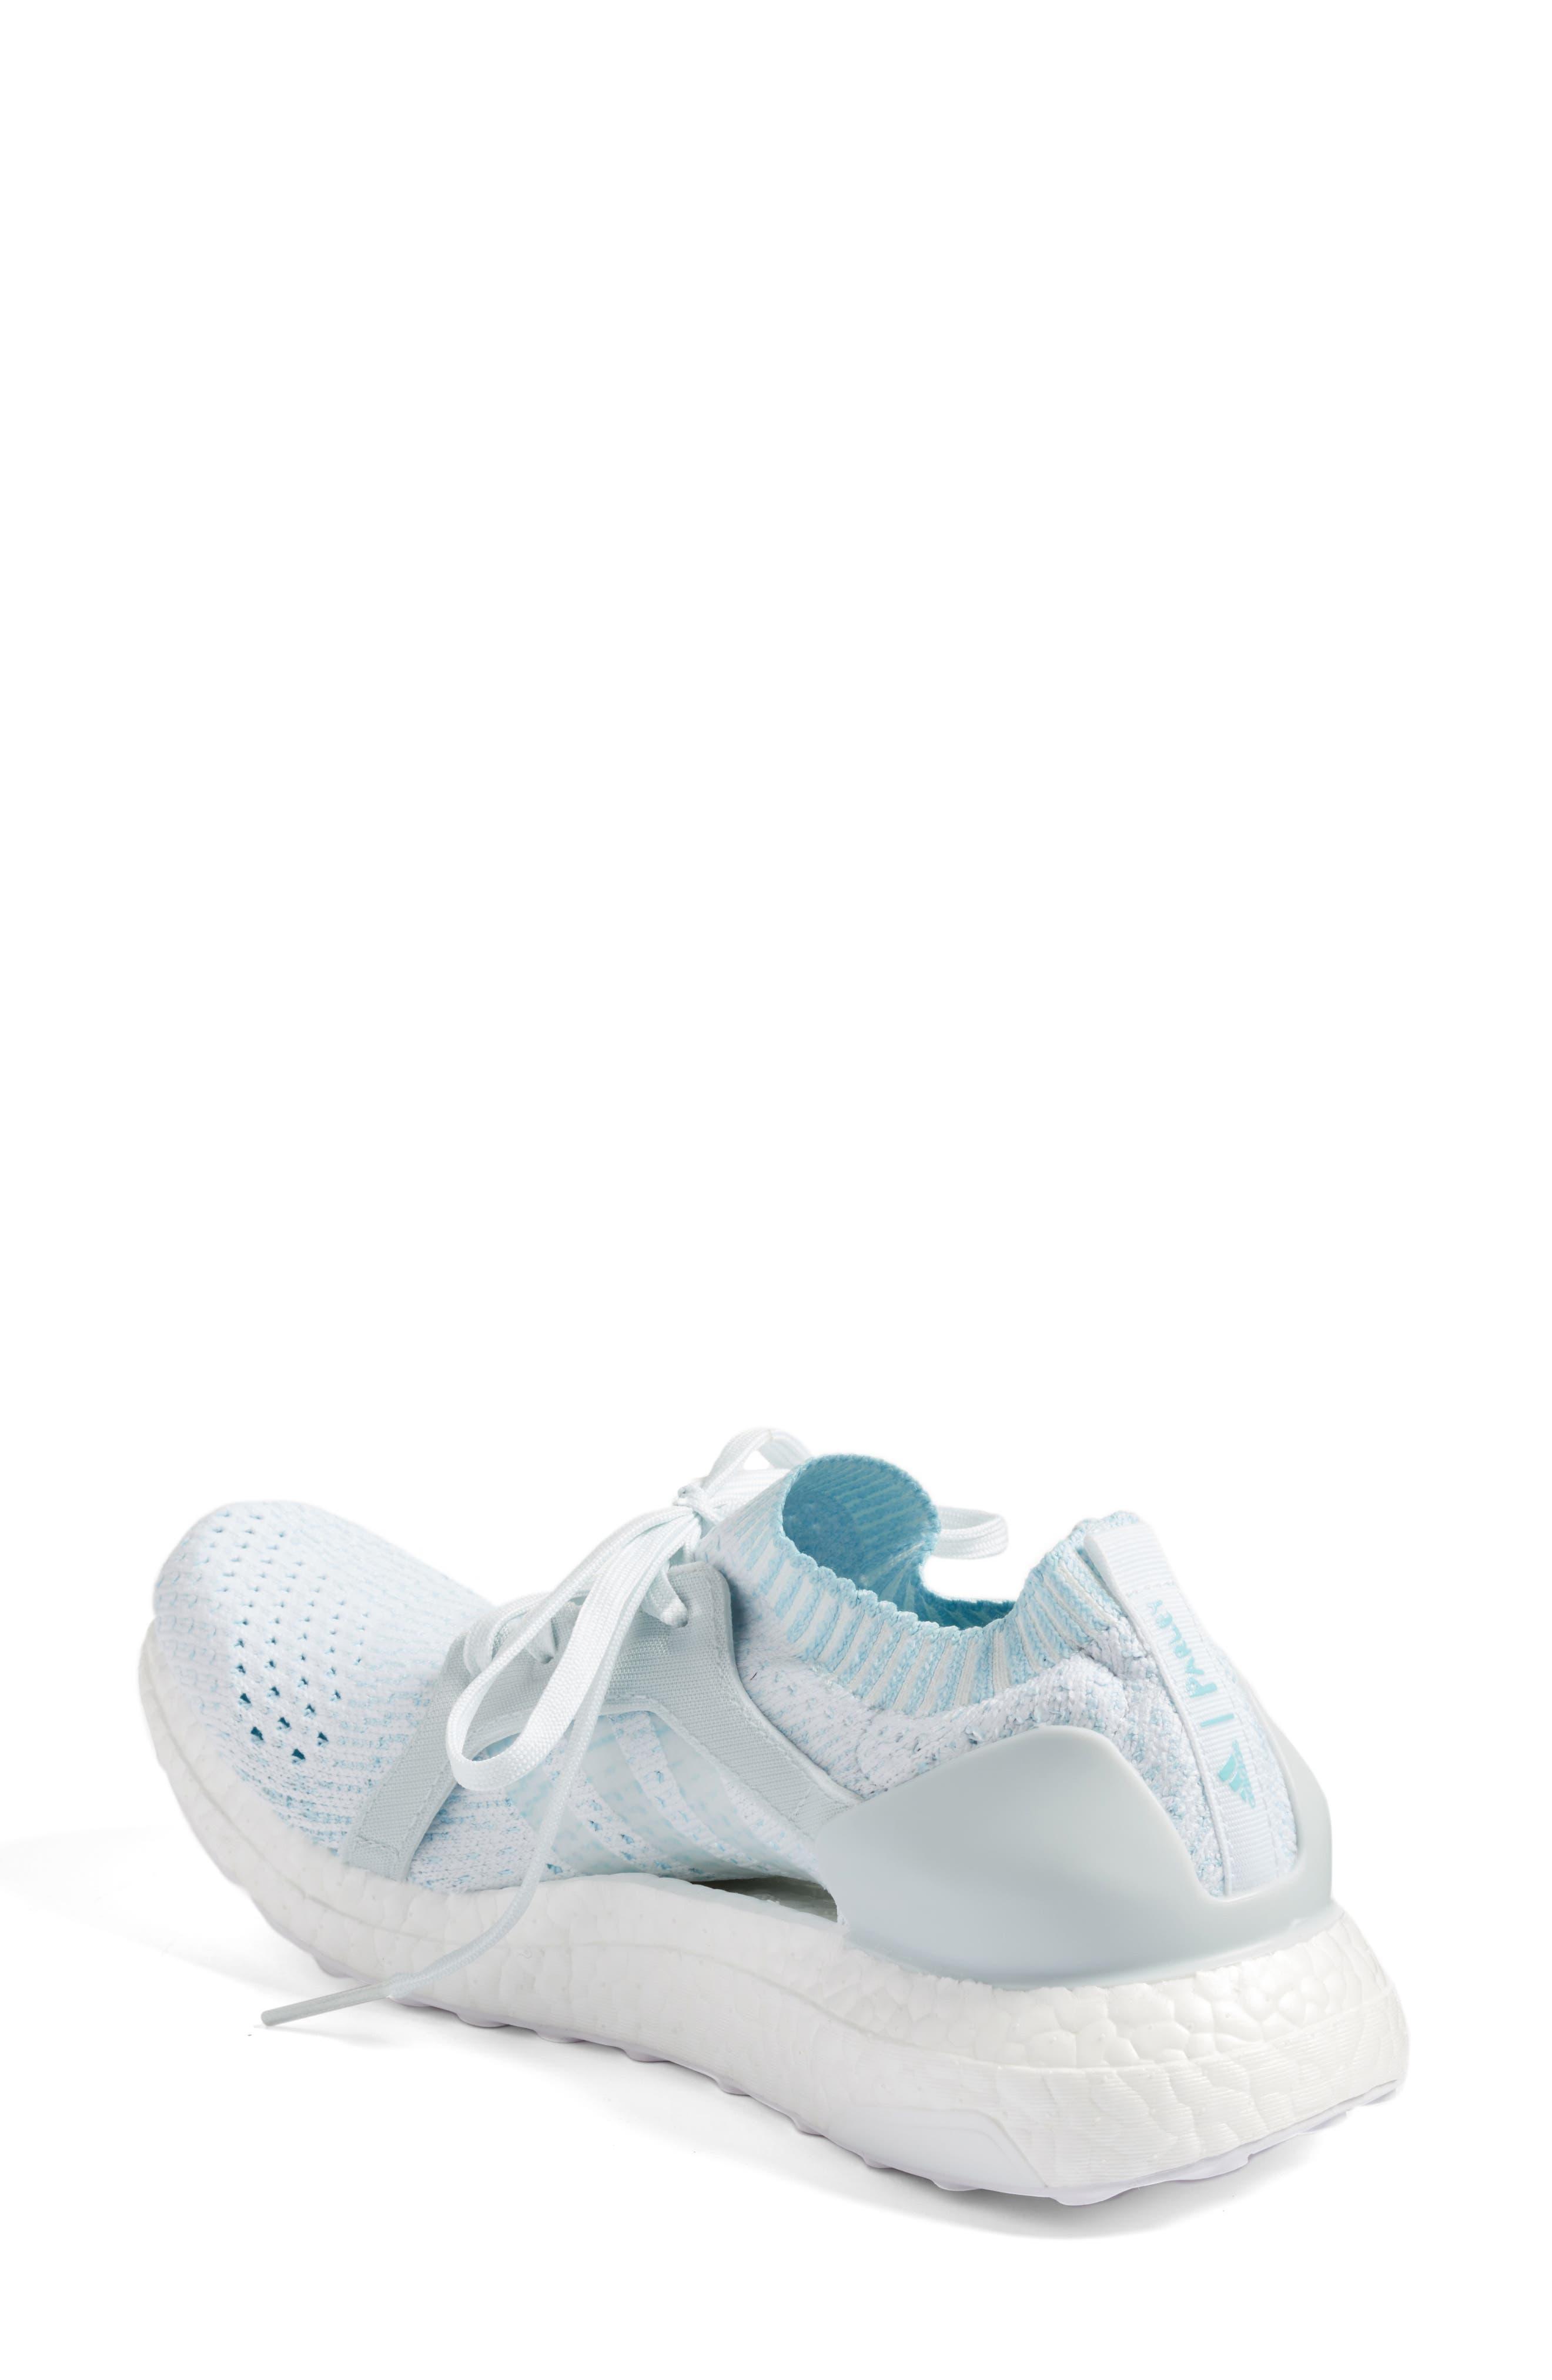 Alternate Image 2  - adidas Ultraboost x Parley Running Shoe (Women)